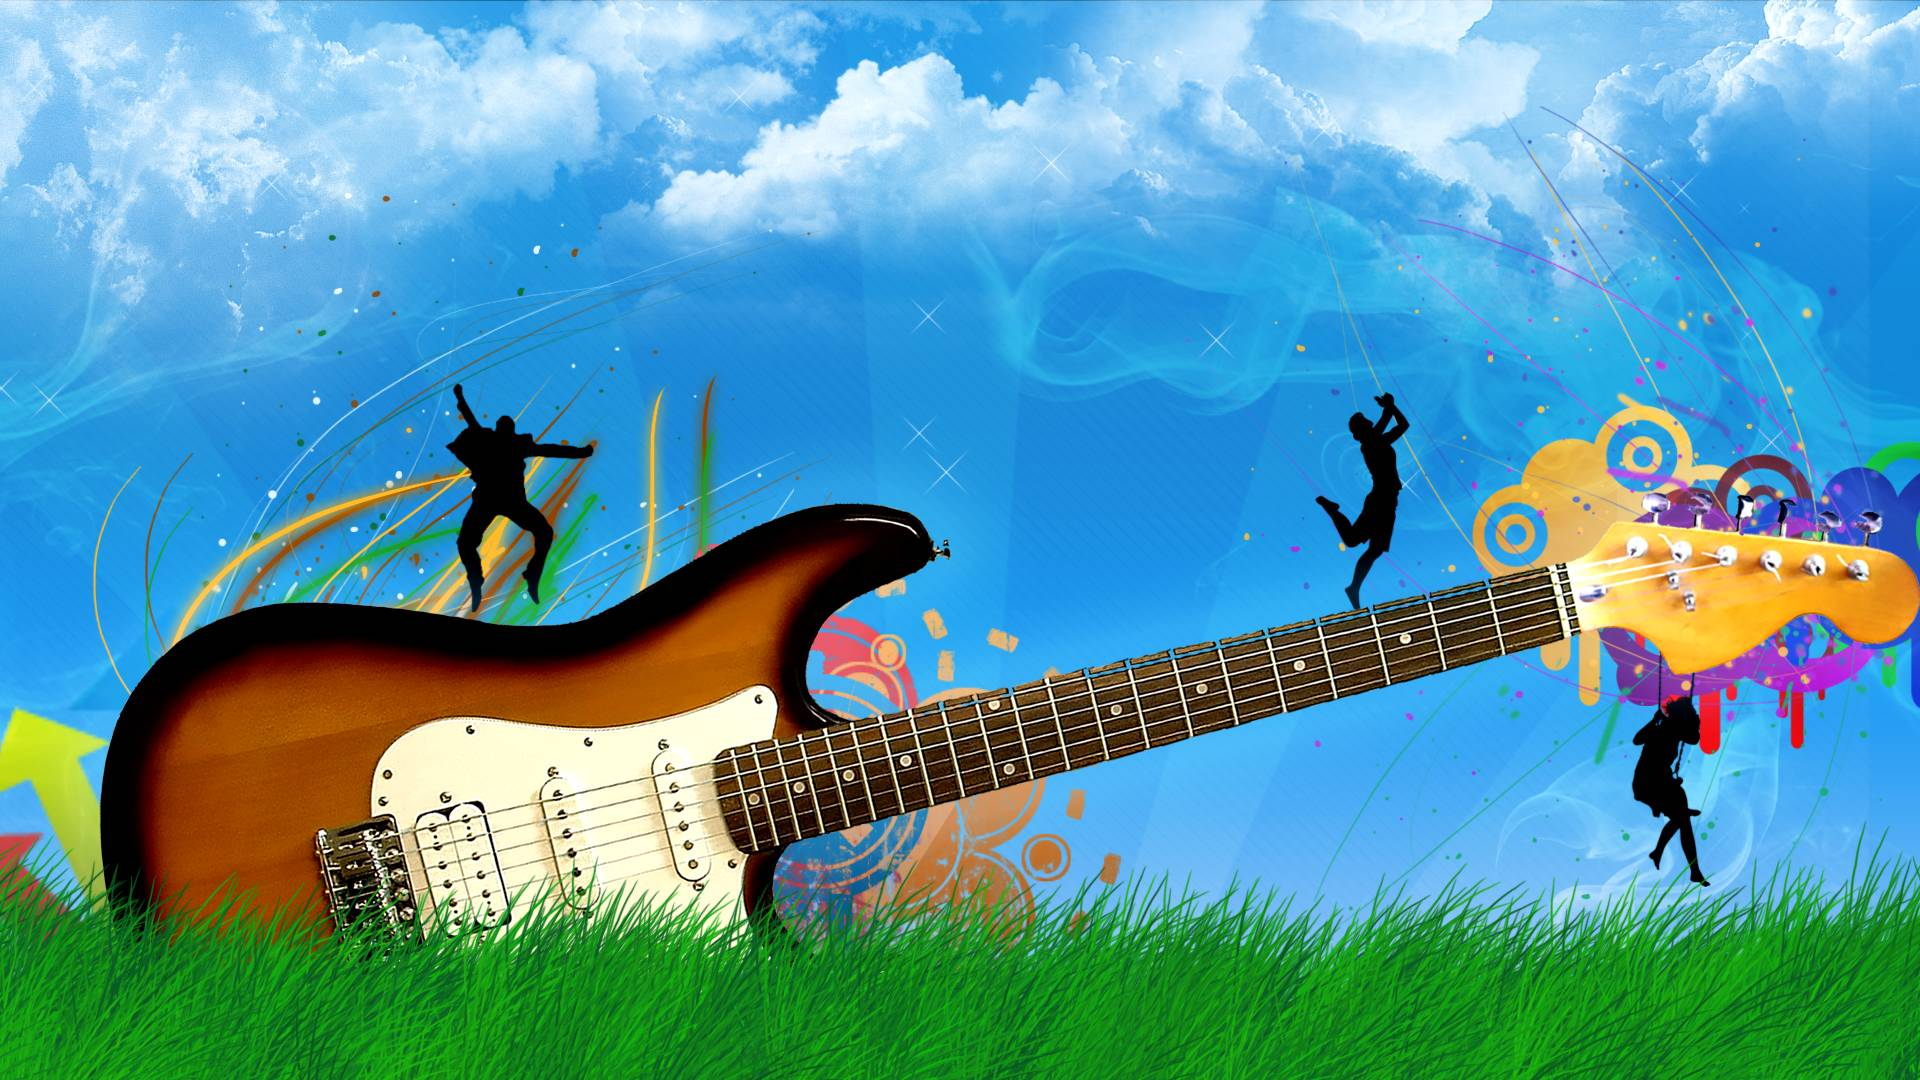 guitar wallpapers for desktop wallpaper cave